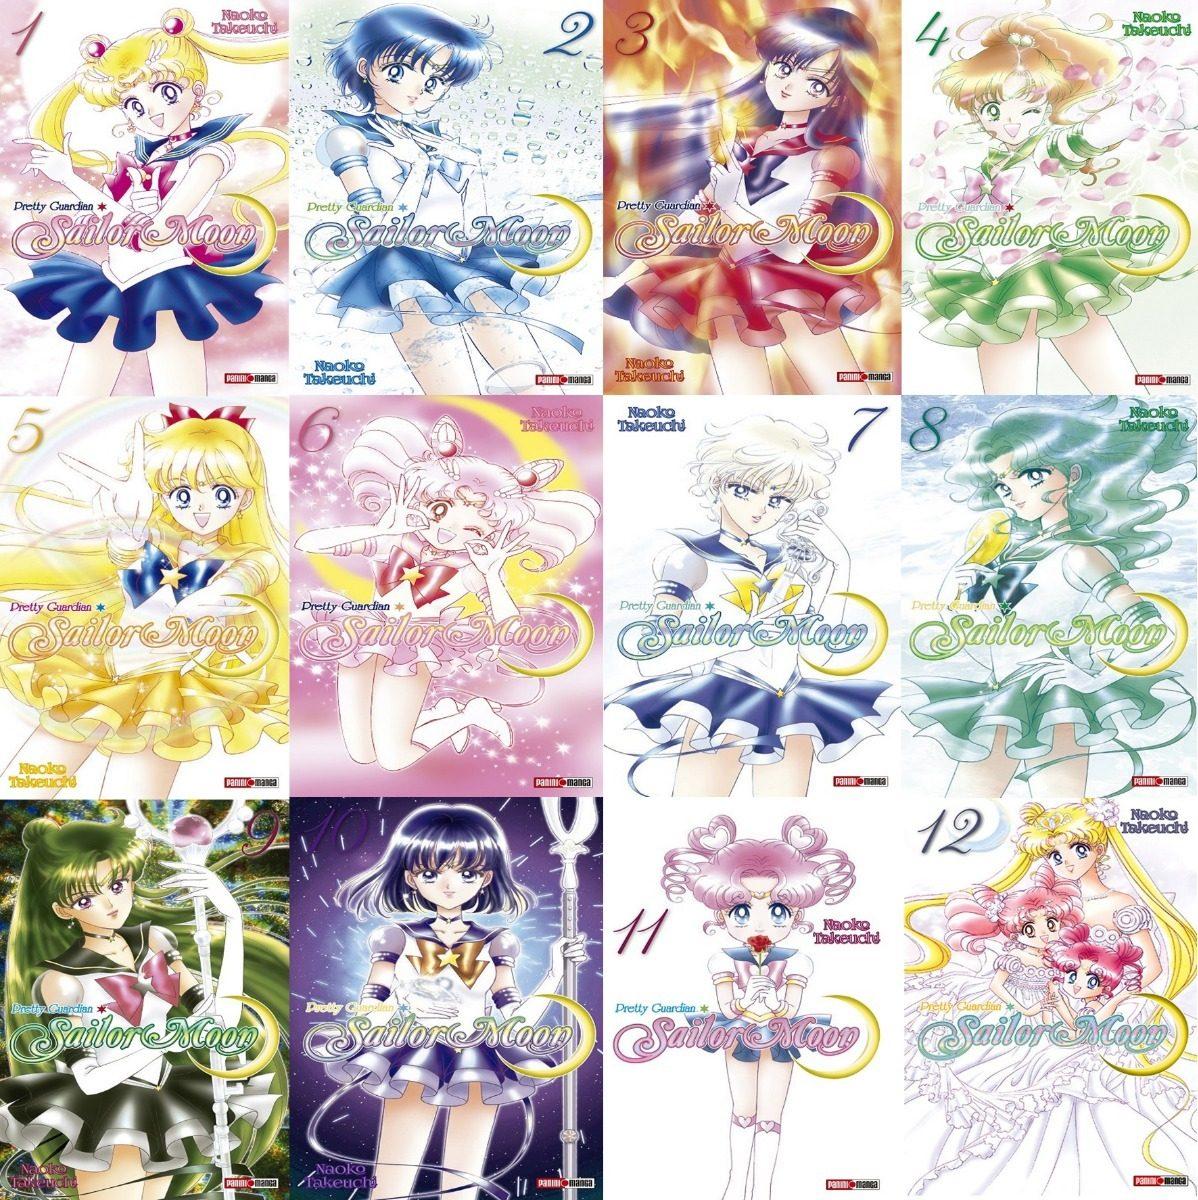 Sailor Moon Manga Panini Español Completo 12 Tomos - $ 1,145.00 en ...